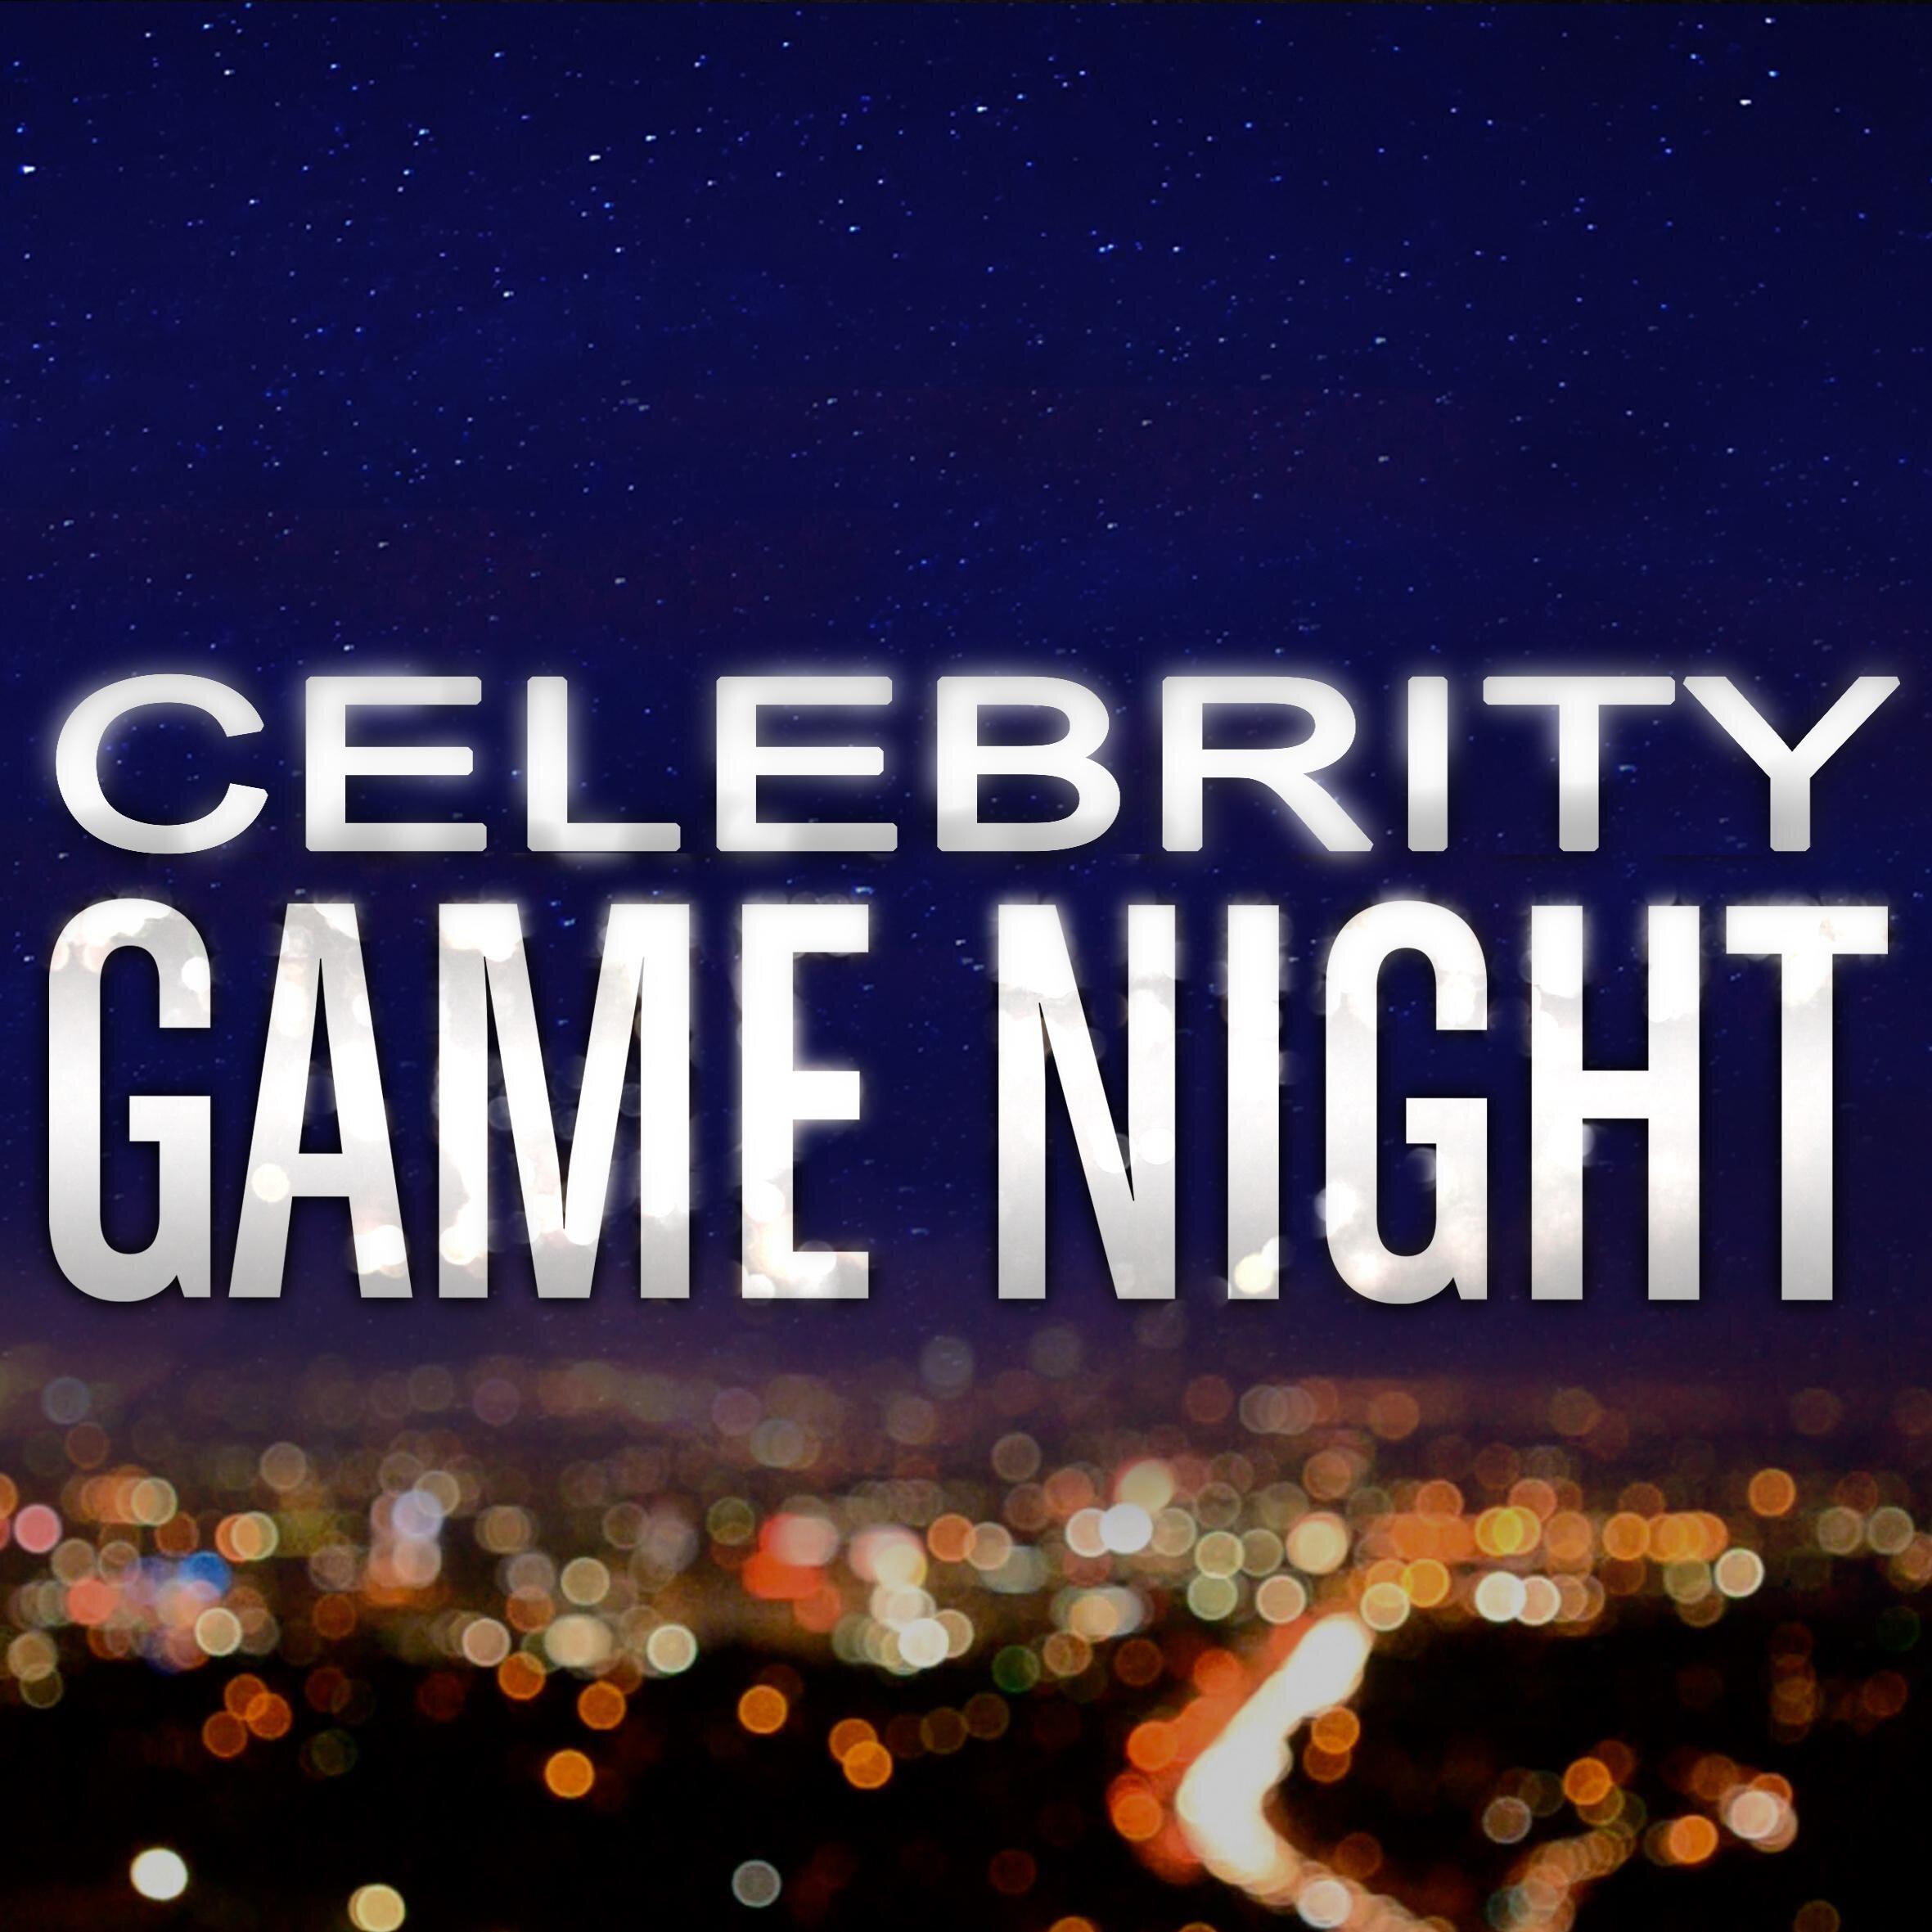 «Celebrity Game Night»: Δεν φαντάζεσαι ποιός αναλαμβάνει την παρουσίαση του νέου τηλεπαιχνιδιού του ΑΝΤ1… | tlife.gr